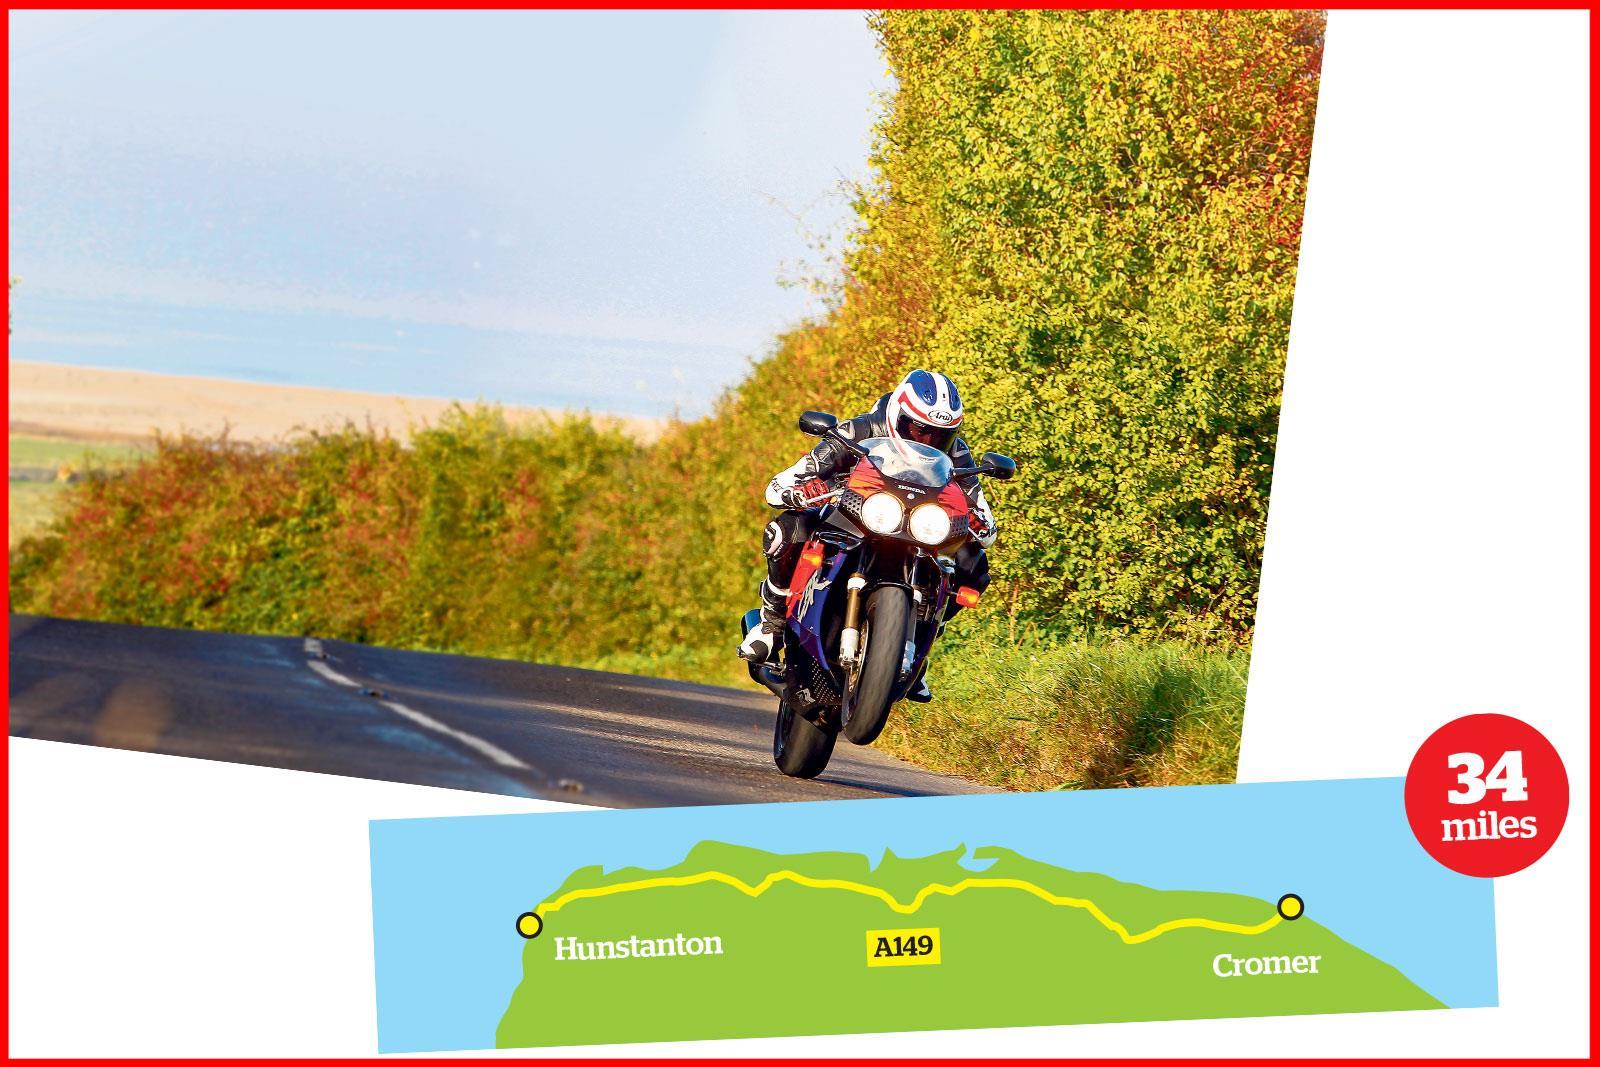 Hunstanton to Cromer A419 ride